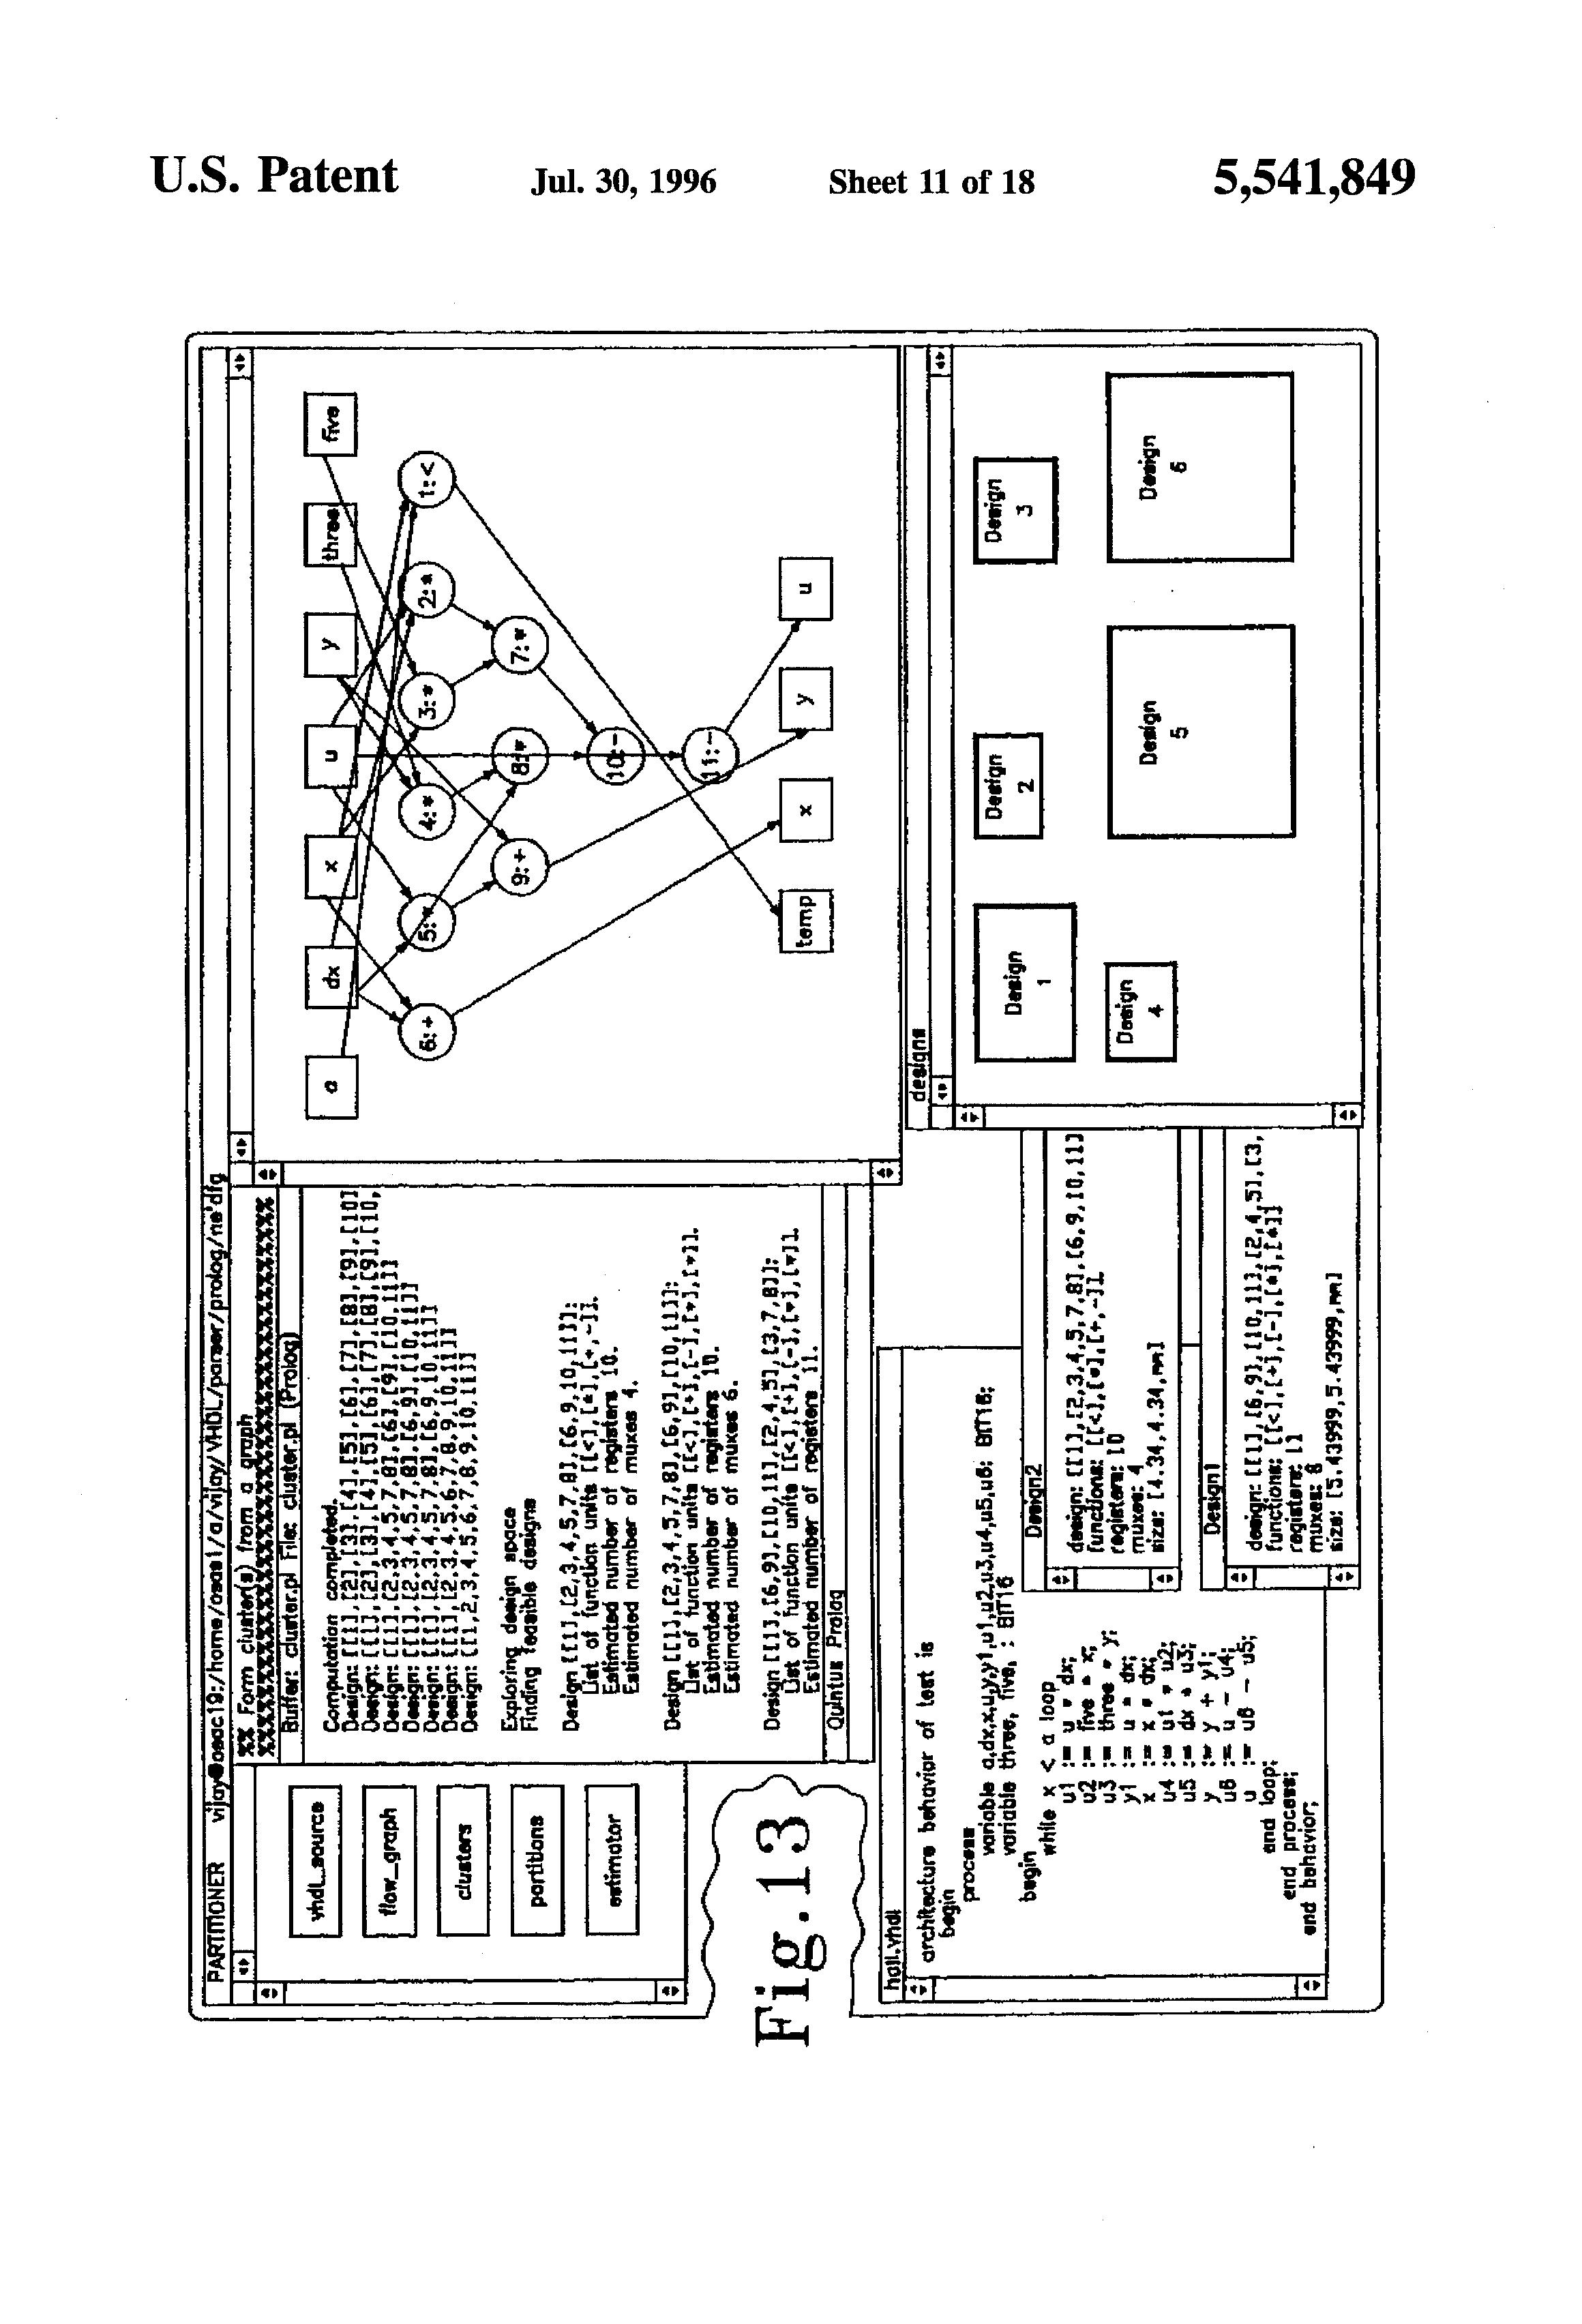 Block Diagram App besides Functional electrical stimulation moreover Functional Architecture Diagram Visio together with High Level Block Diagram further 7C 7C4 bp blogspot   7C kqvWI9Zthvk 7CS9eC8LK2t6I 7CAAAAAAAAANk 7CoJ9mJMip 3I 7Cs1600 7CFFBD 20Stencils. on functional flow block diagram